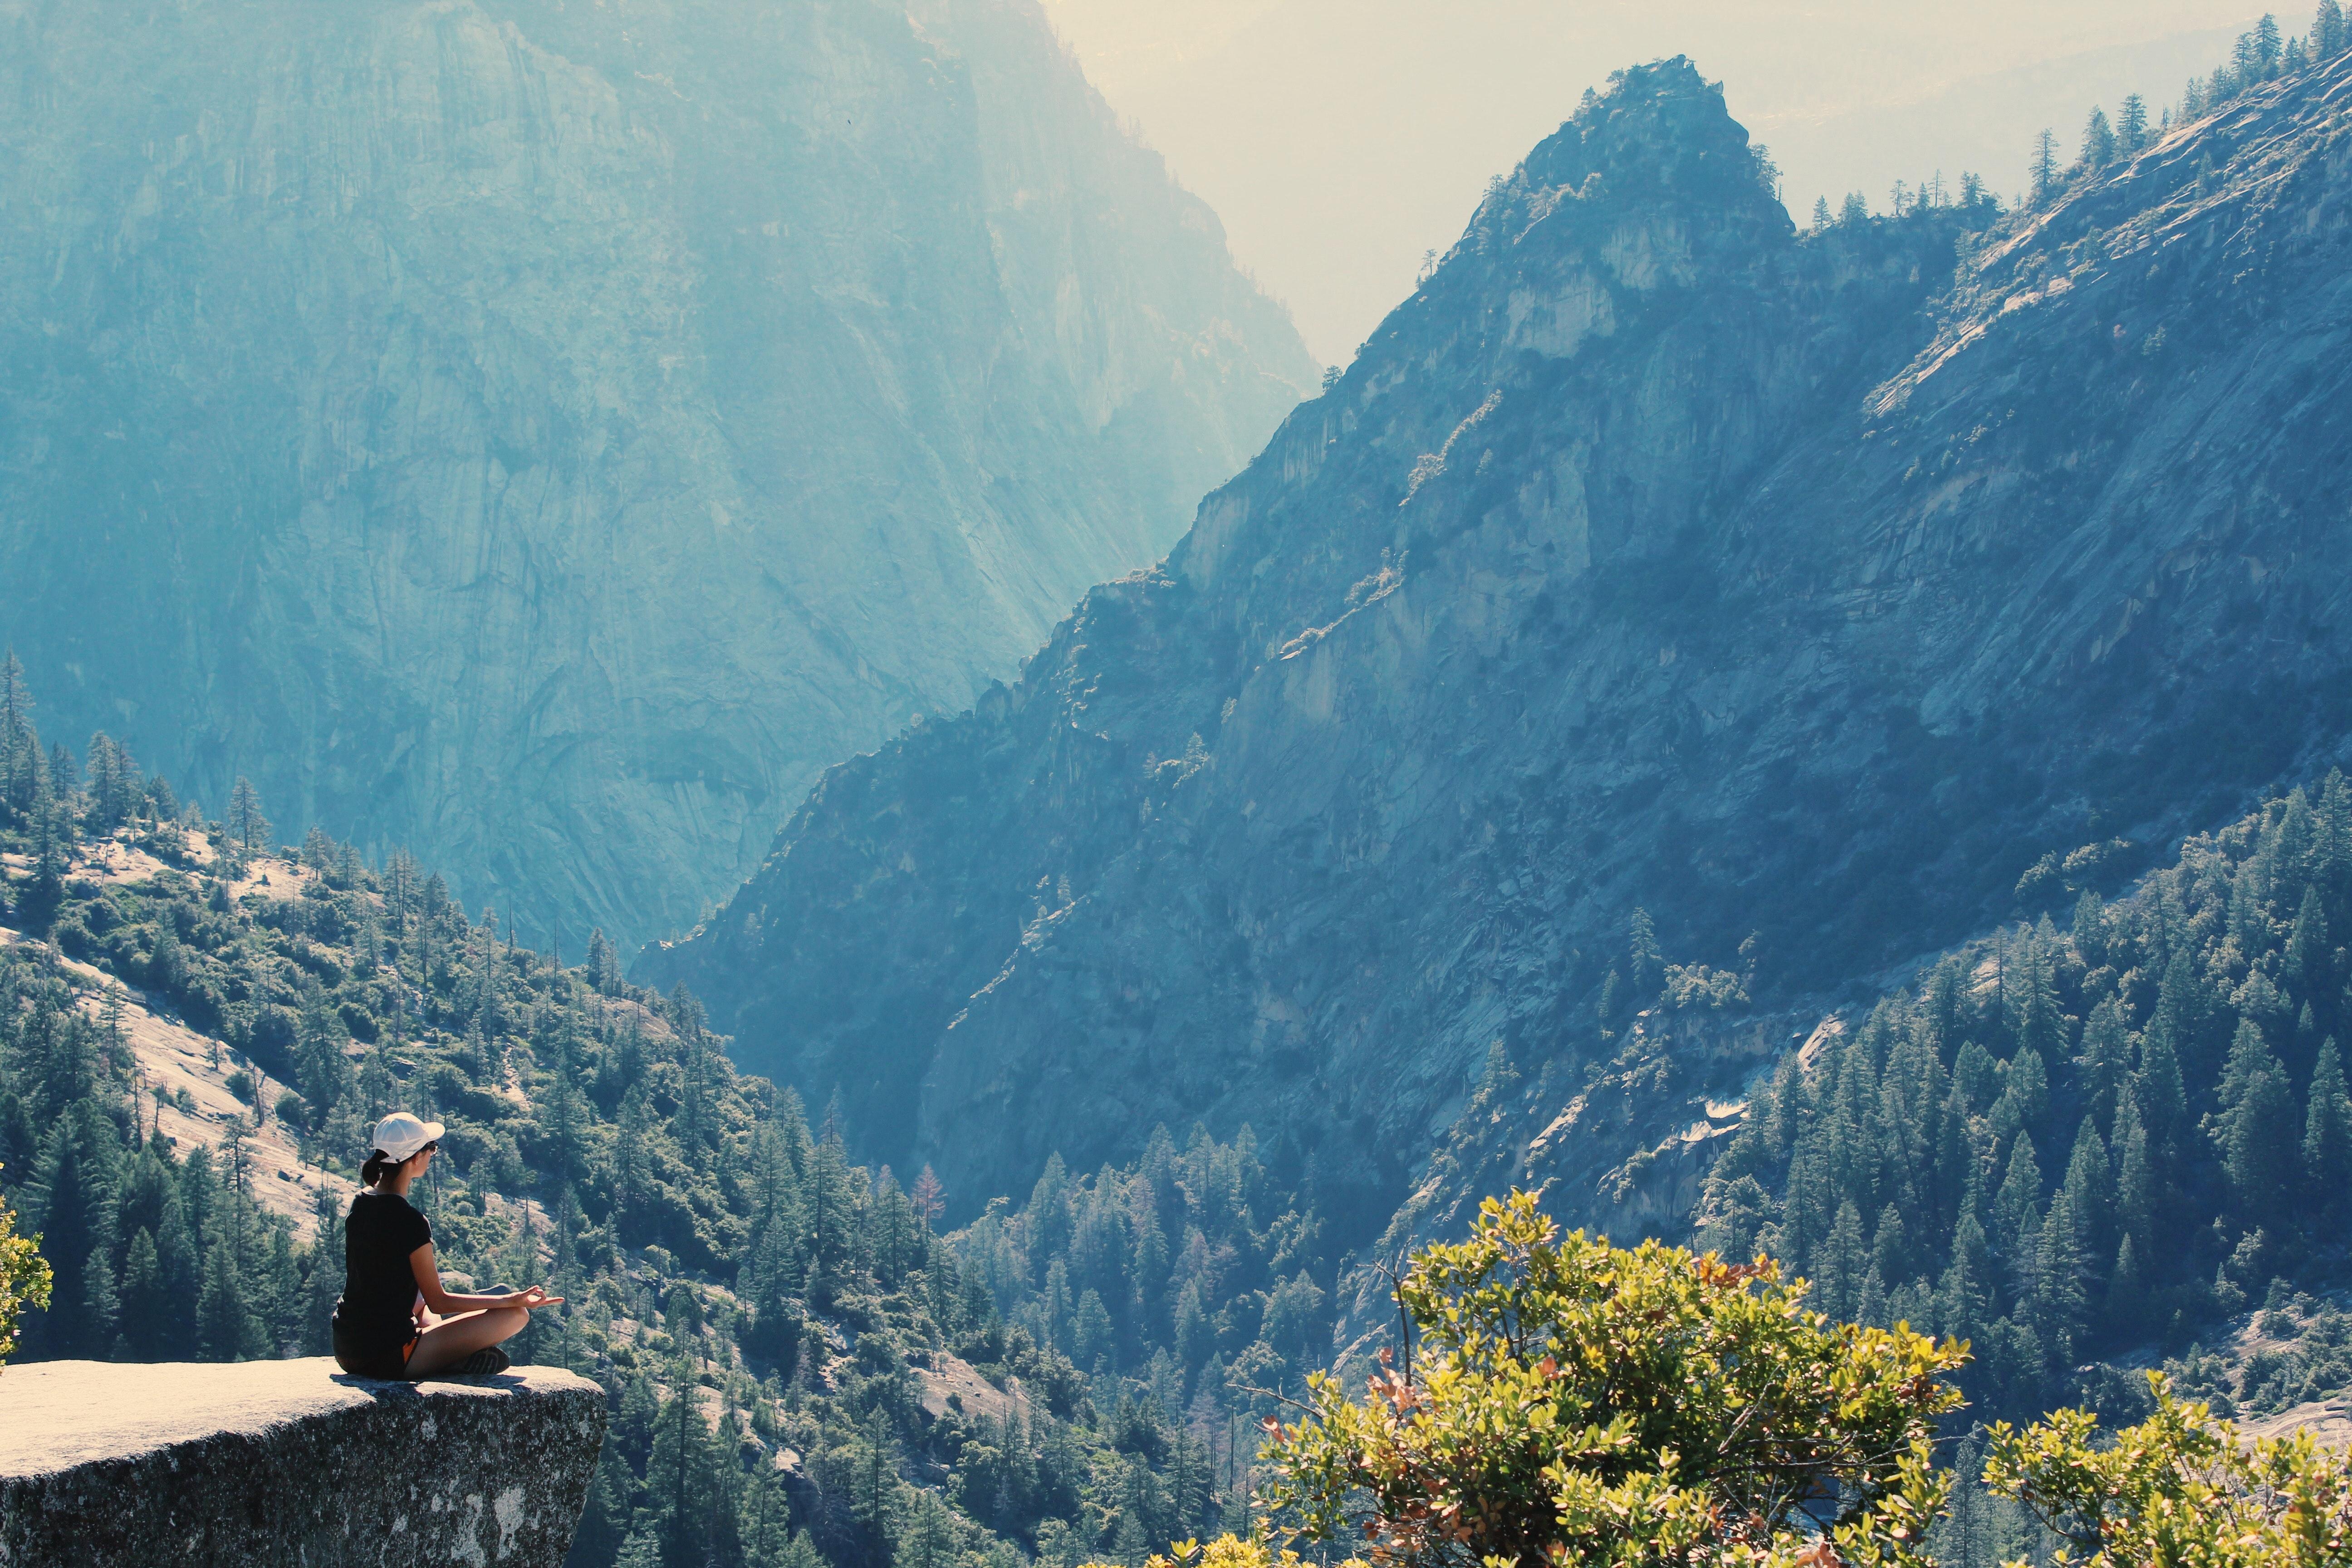 adventure-cliff-environment-906097